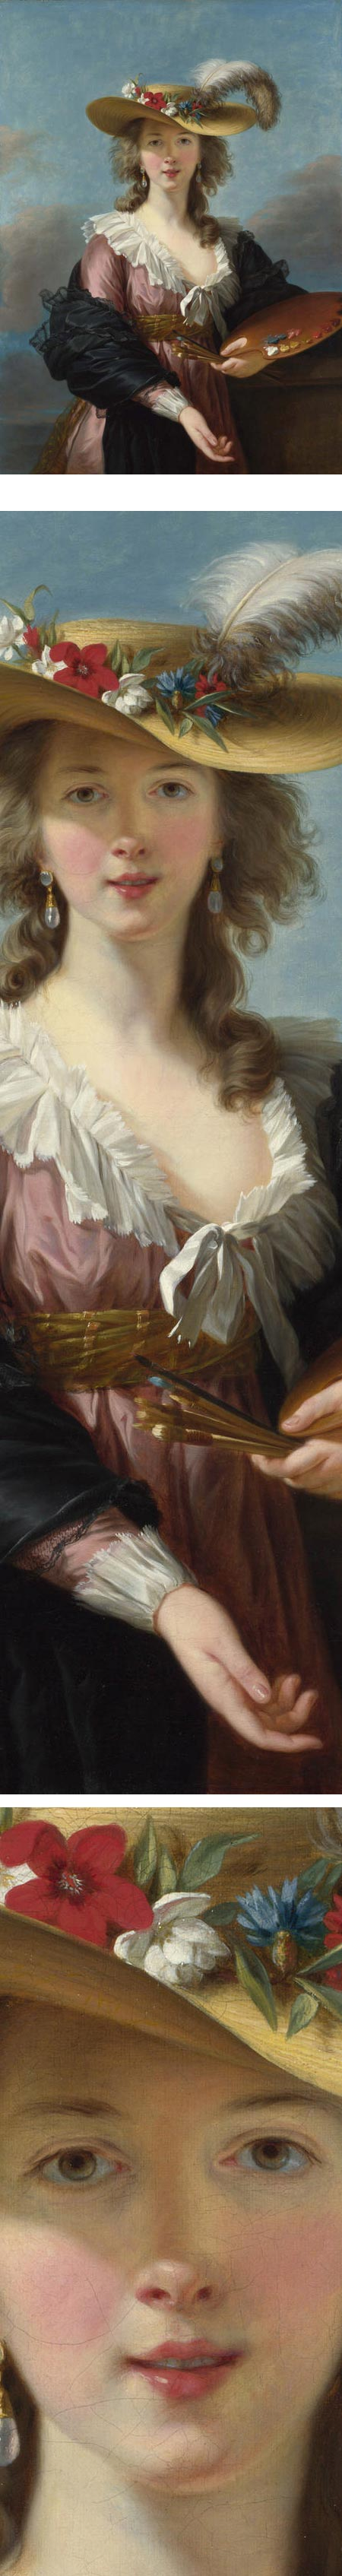 Self Portrait in a Straw Hat, Elisabeth Louise Vigee Le Bru